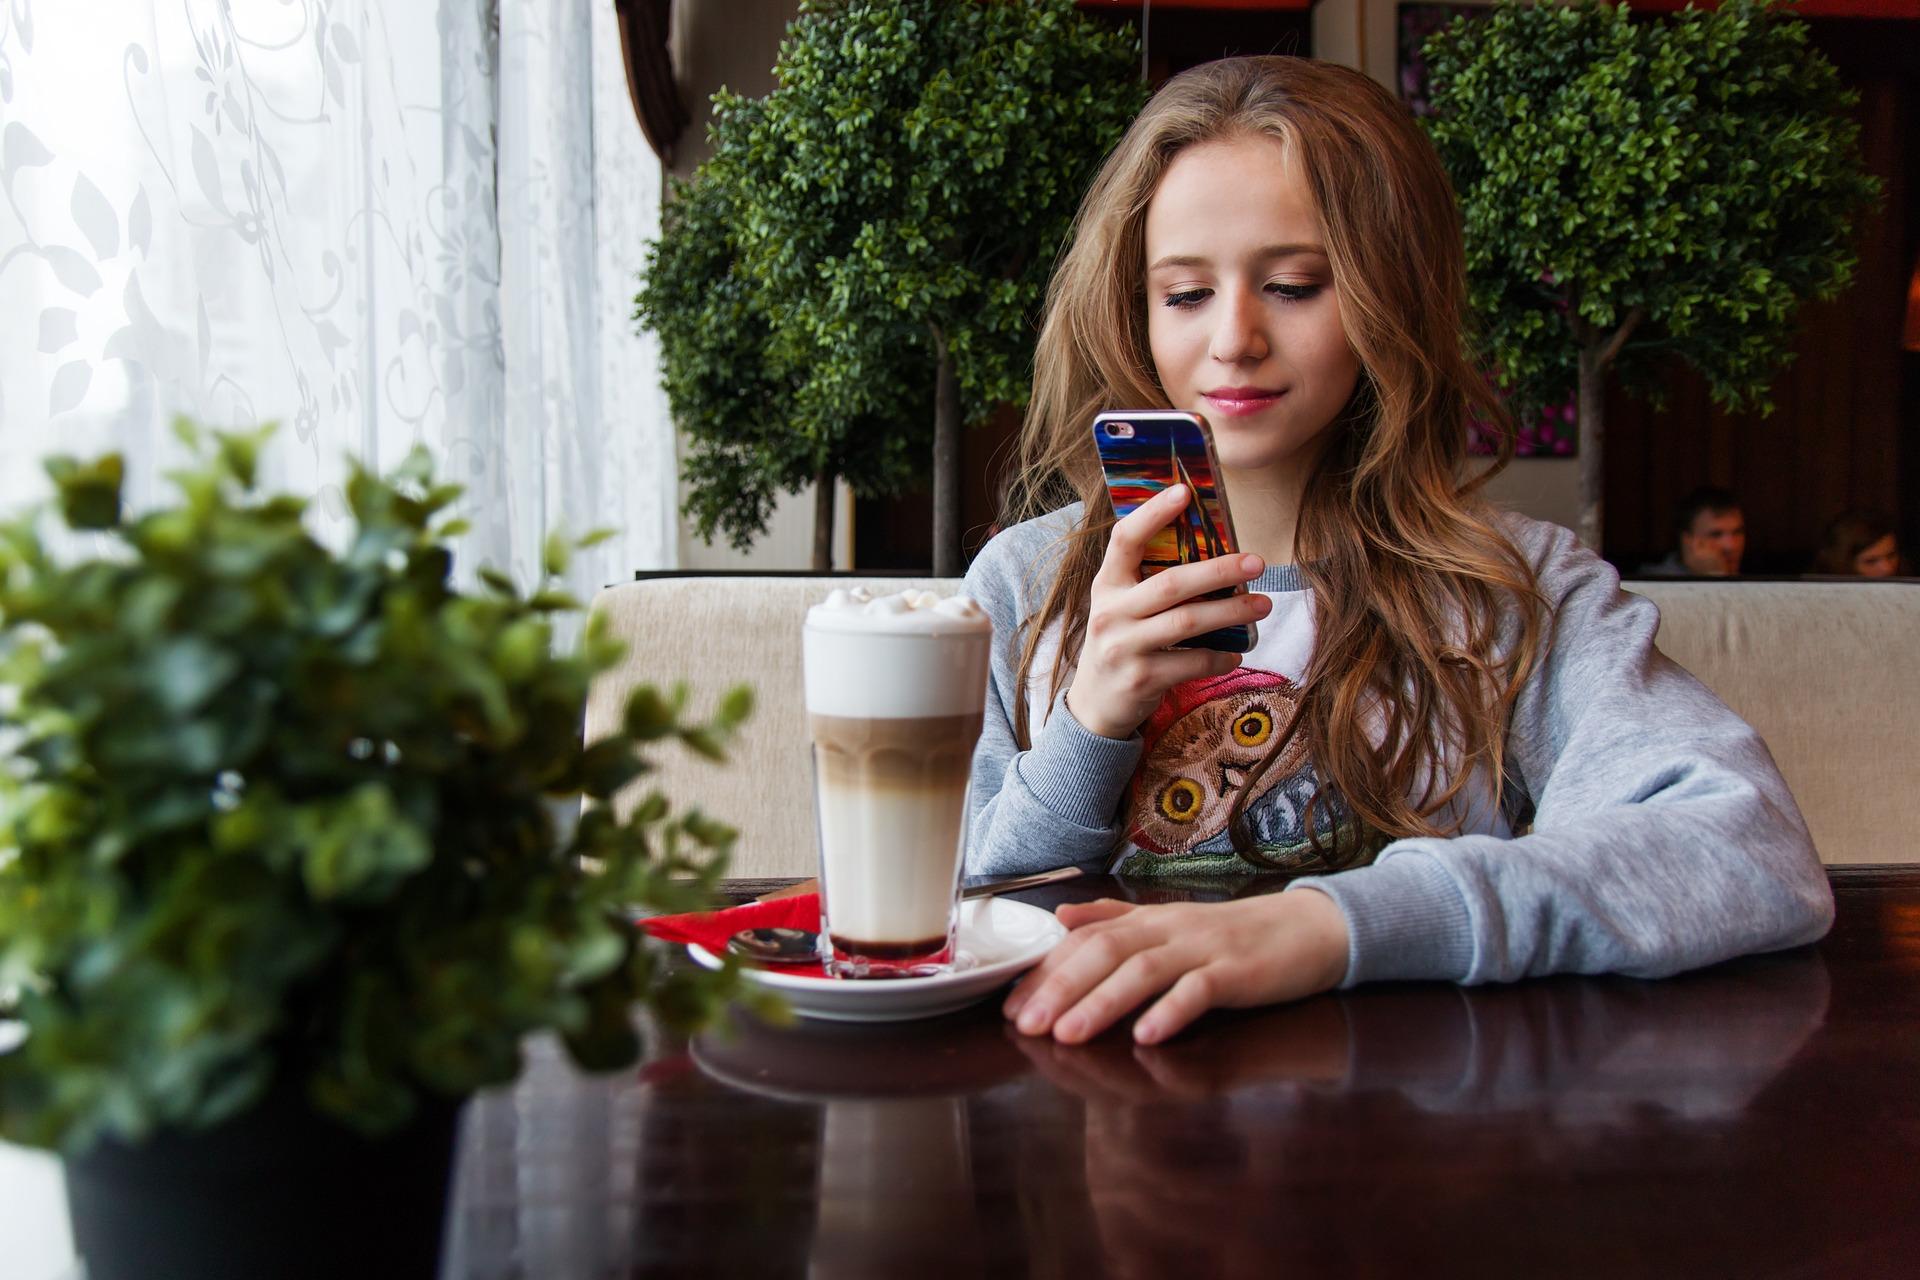 Xiaomi Smartphones on AliExpress' Review: Triple Economy